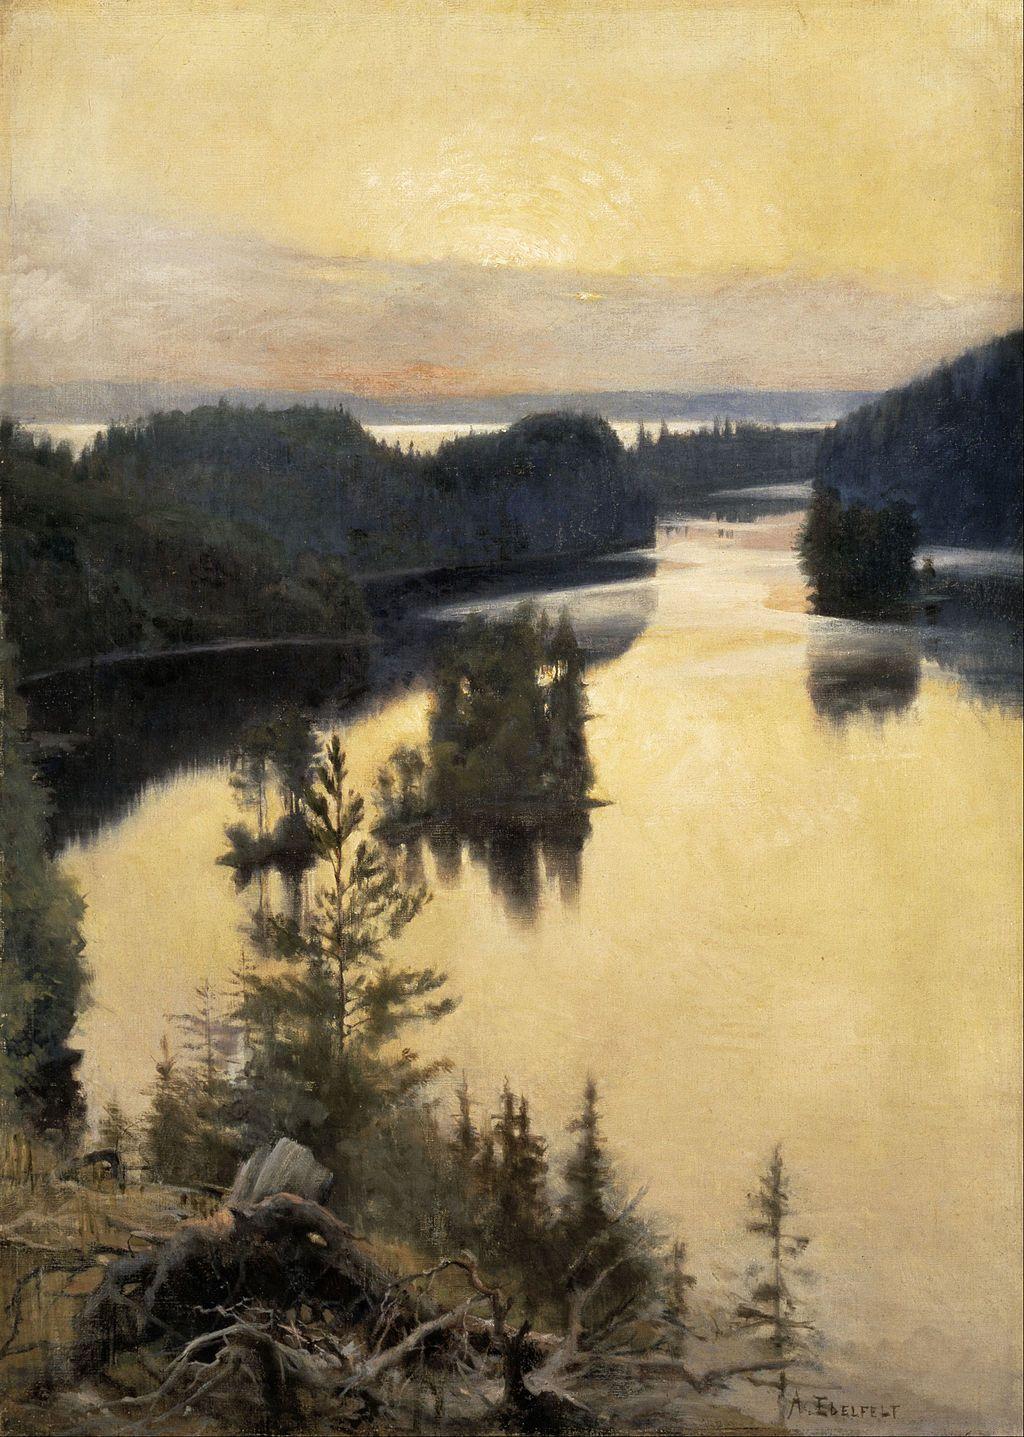 myravenousmindandme: Kaukola Ridge at Sunset 1889-90 Albert Edelfelt